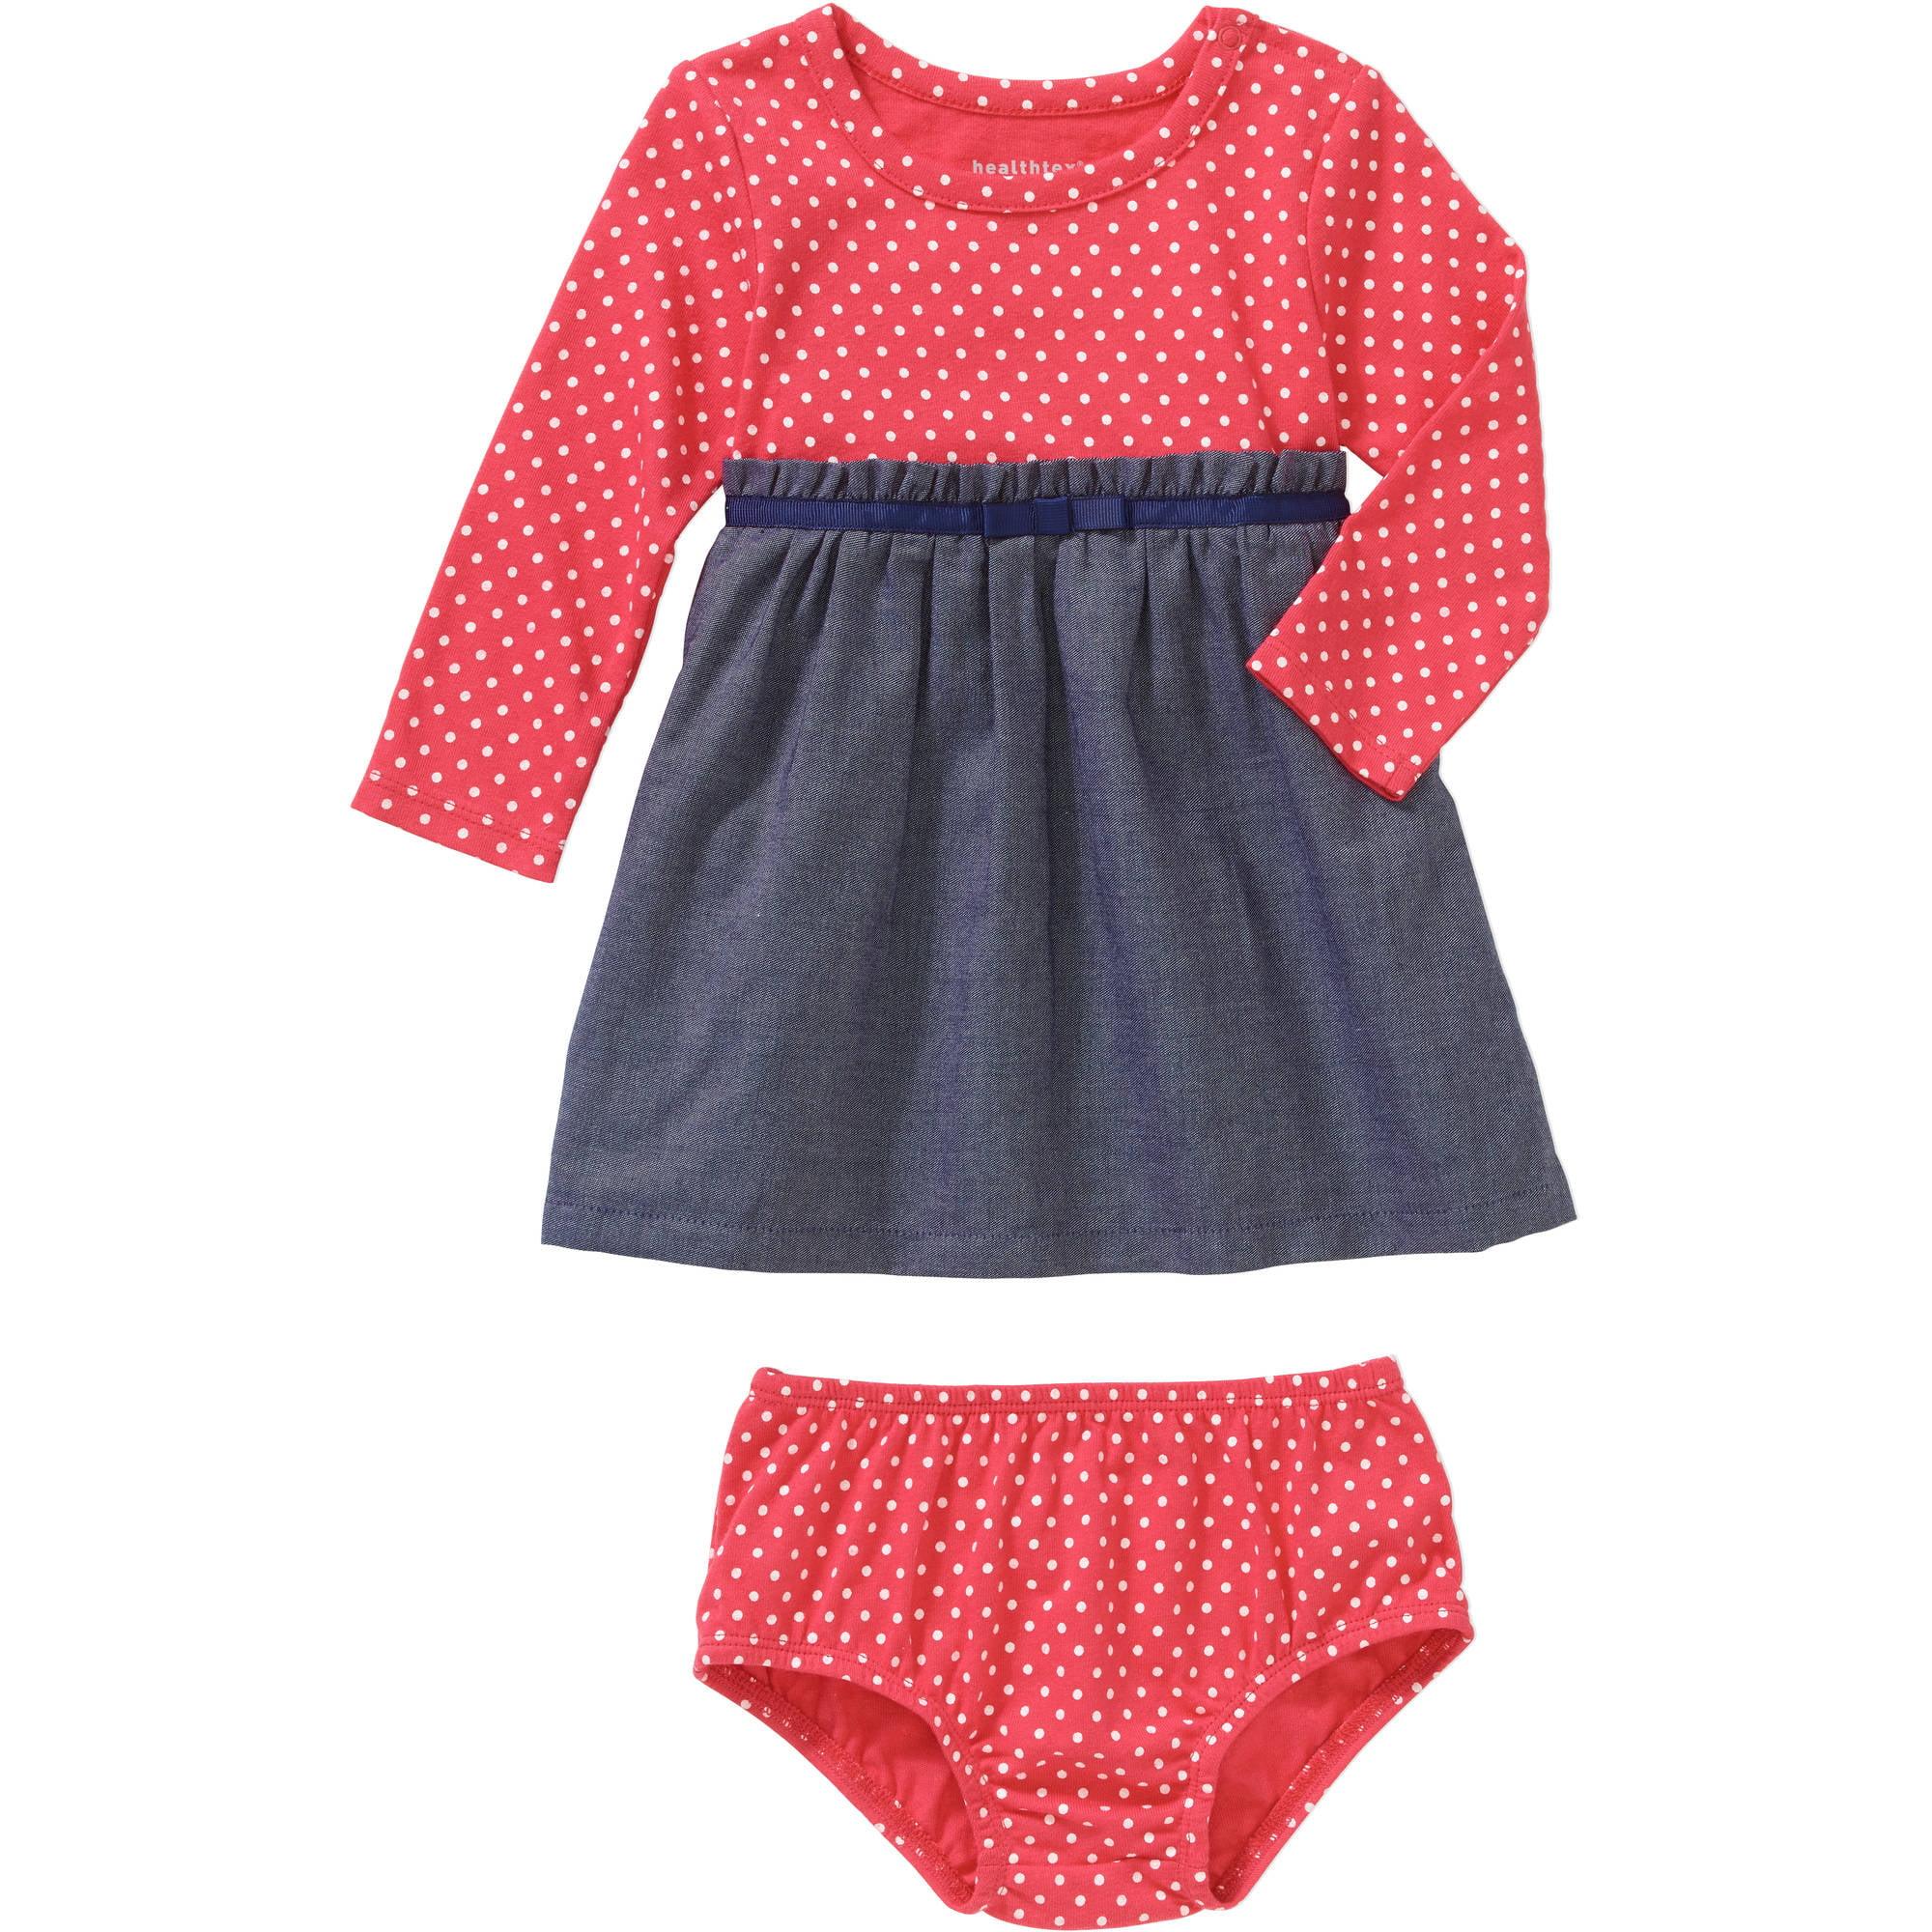 Healthtex Newborn Baby Girls' Knit Short Sleeve 2-Fer Dress and Bloomer Set